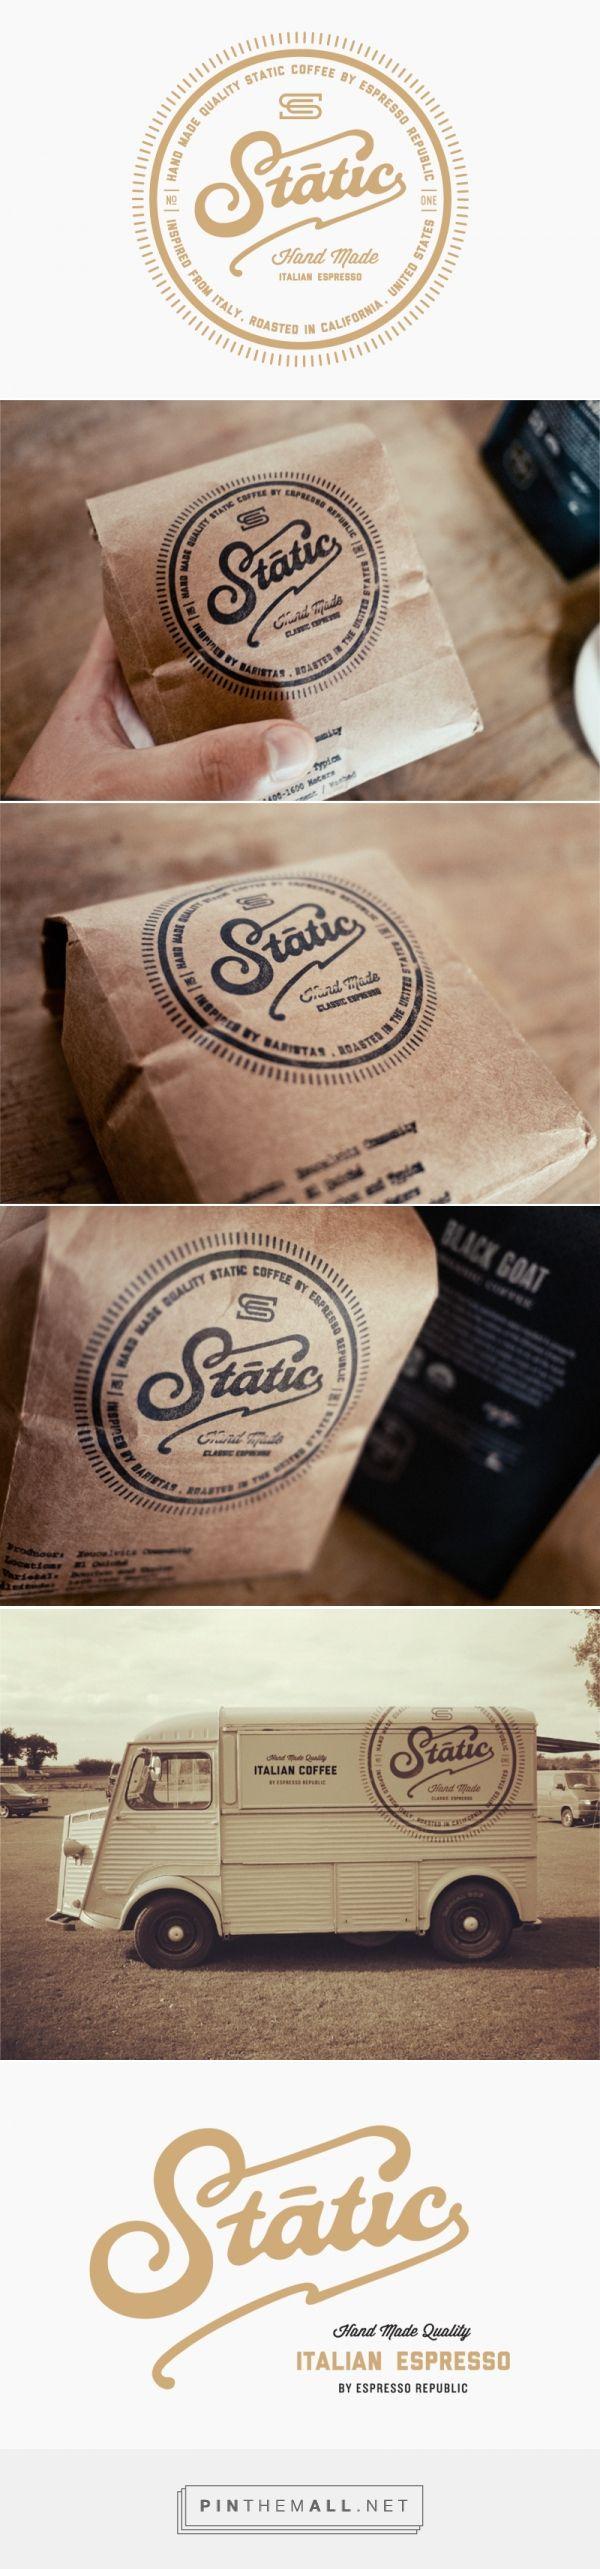 Static Coffee | Salih Kucukaga Design Studio